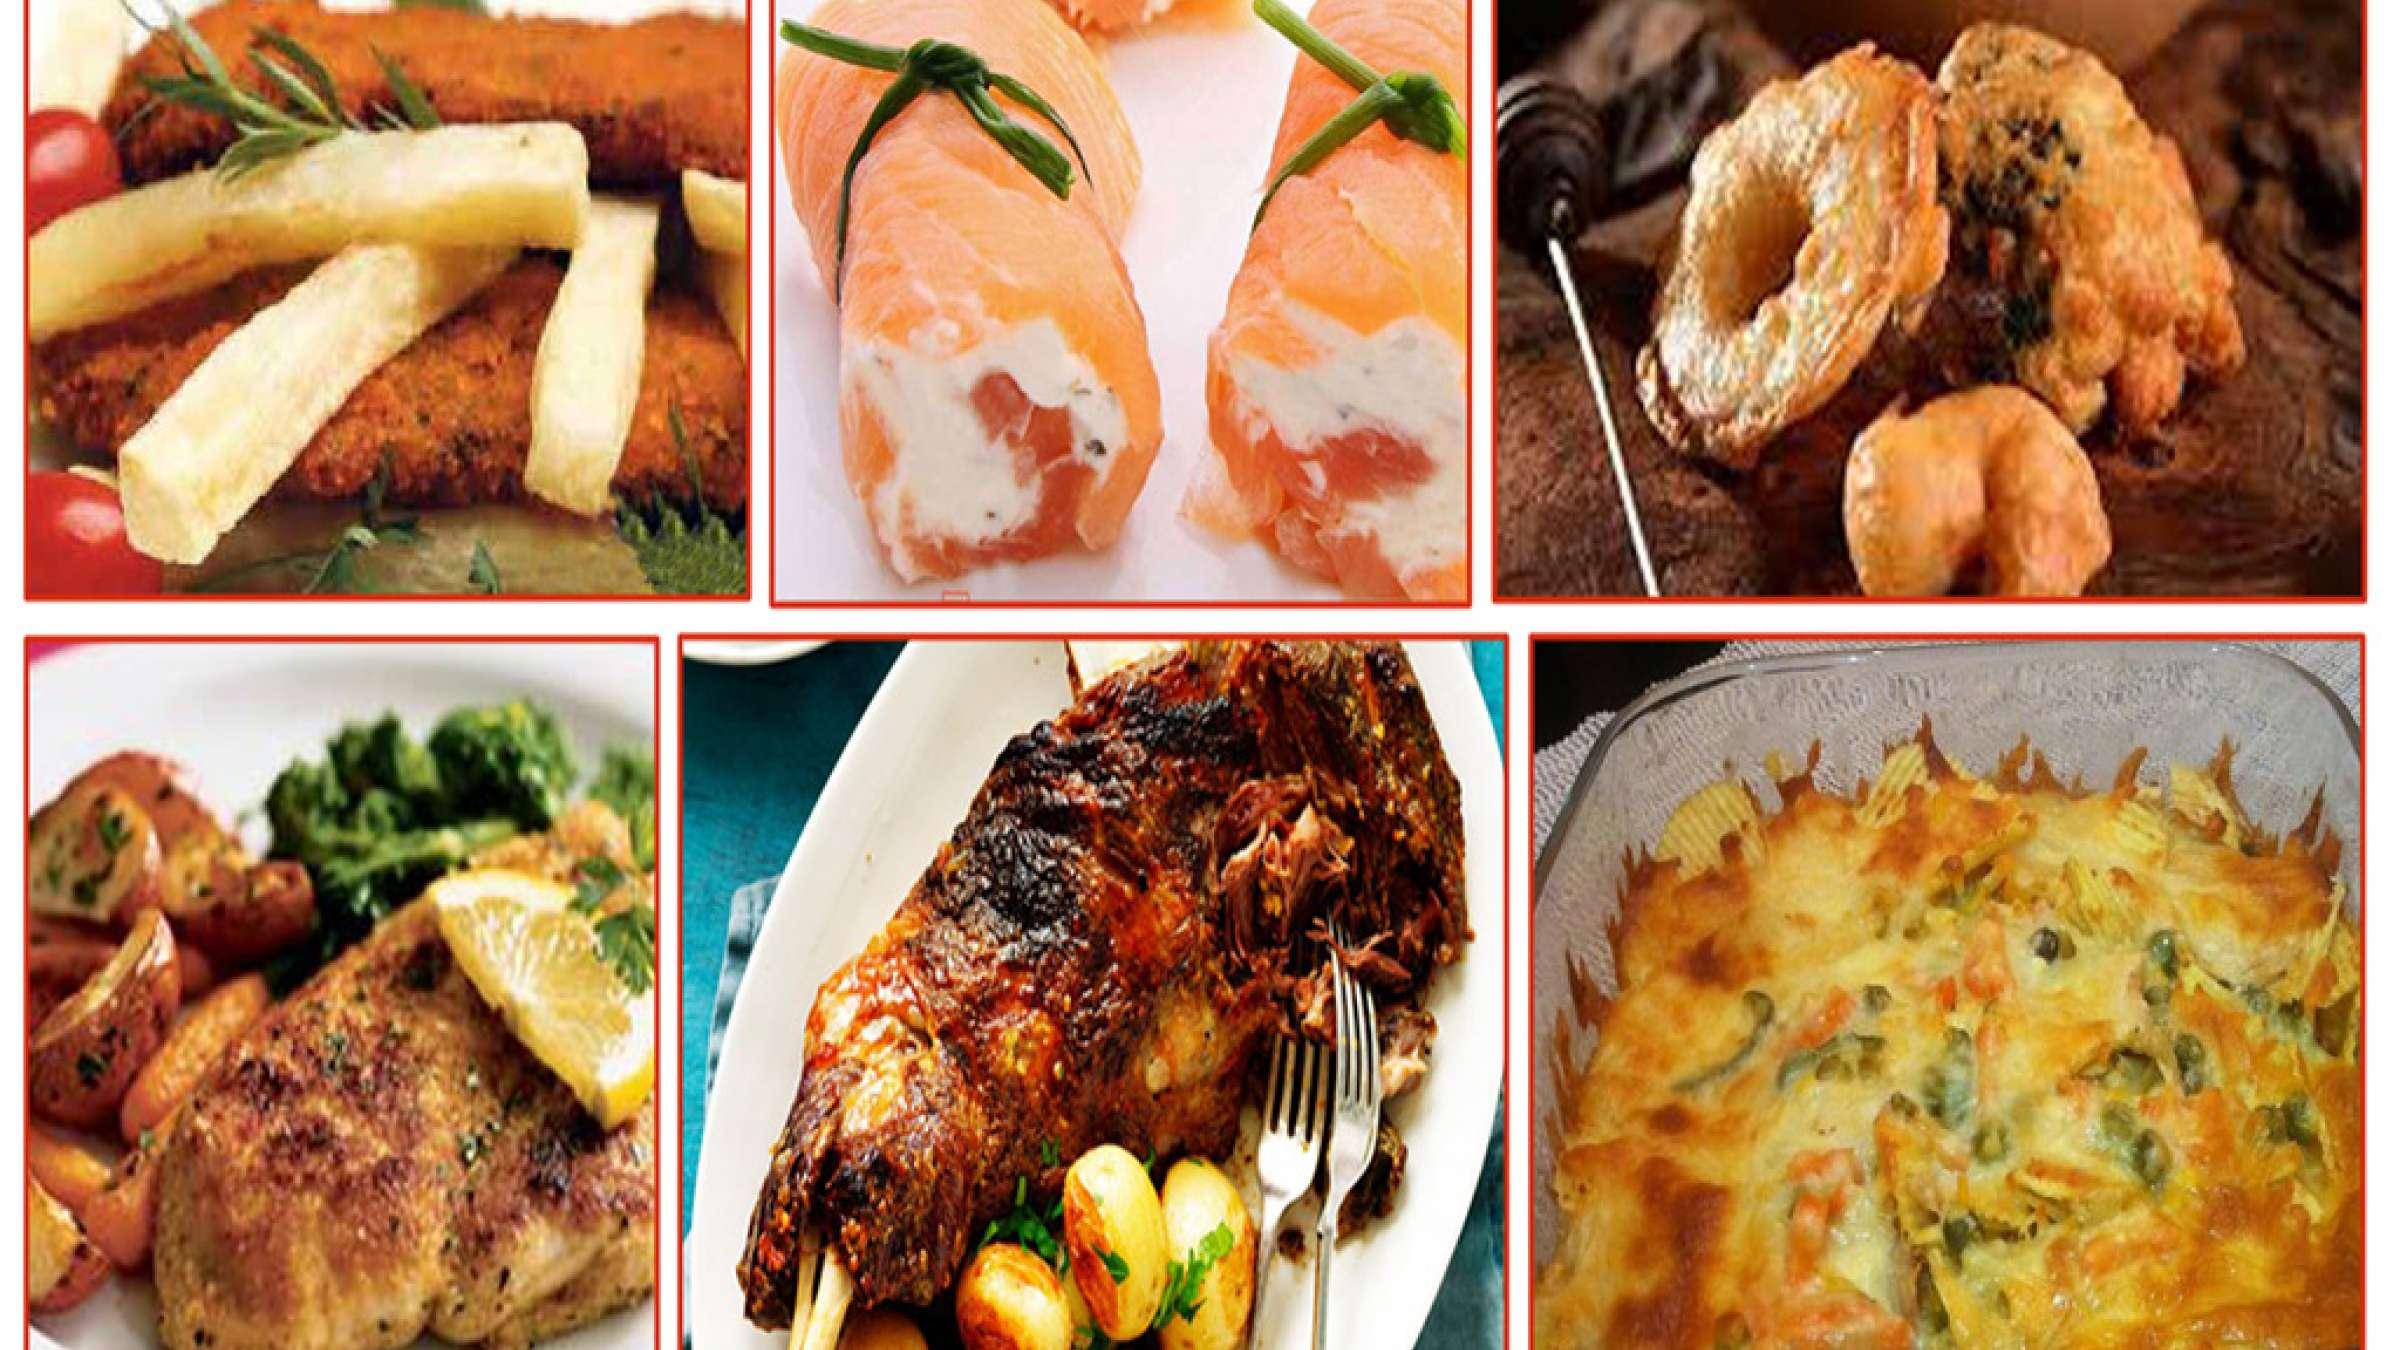 ashpazi-parvin-rol-salamon-graten